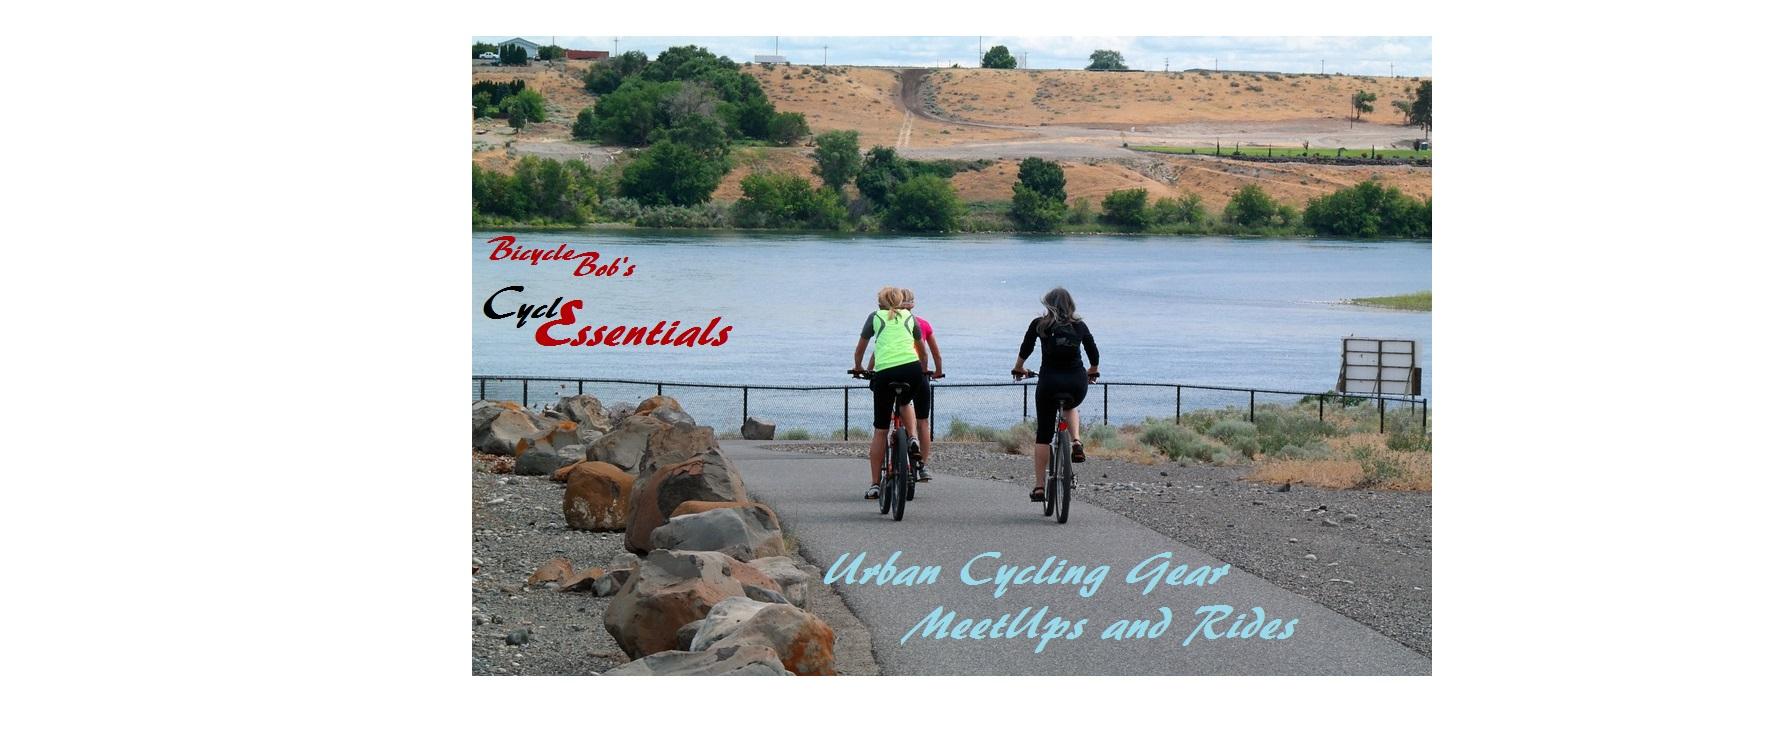 Urban Cycling Gear - MeetUps and